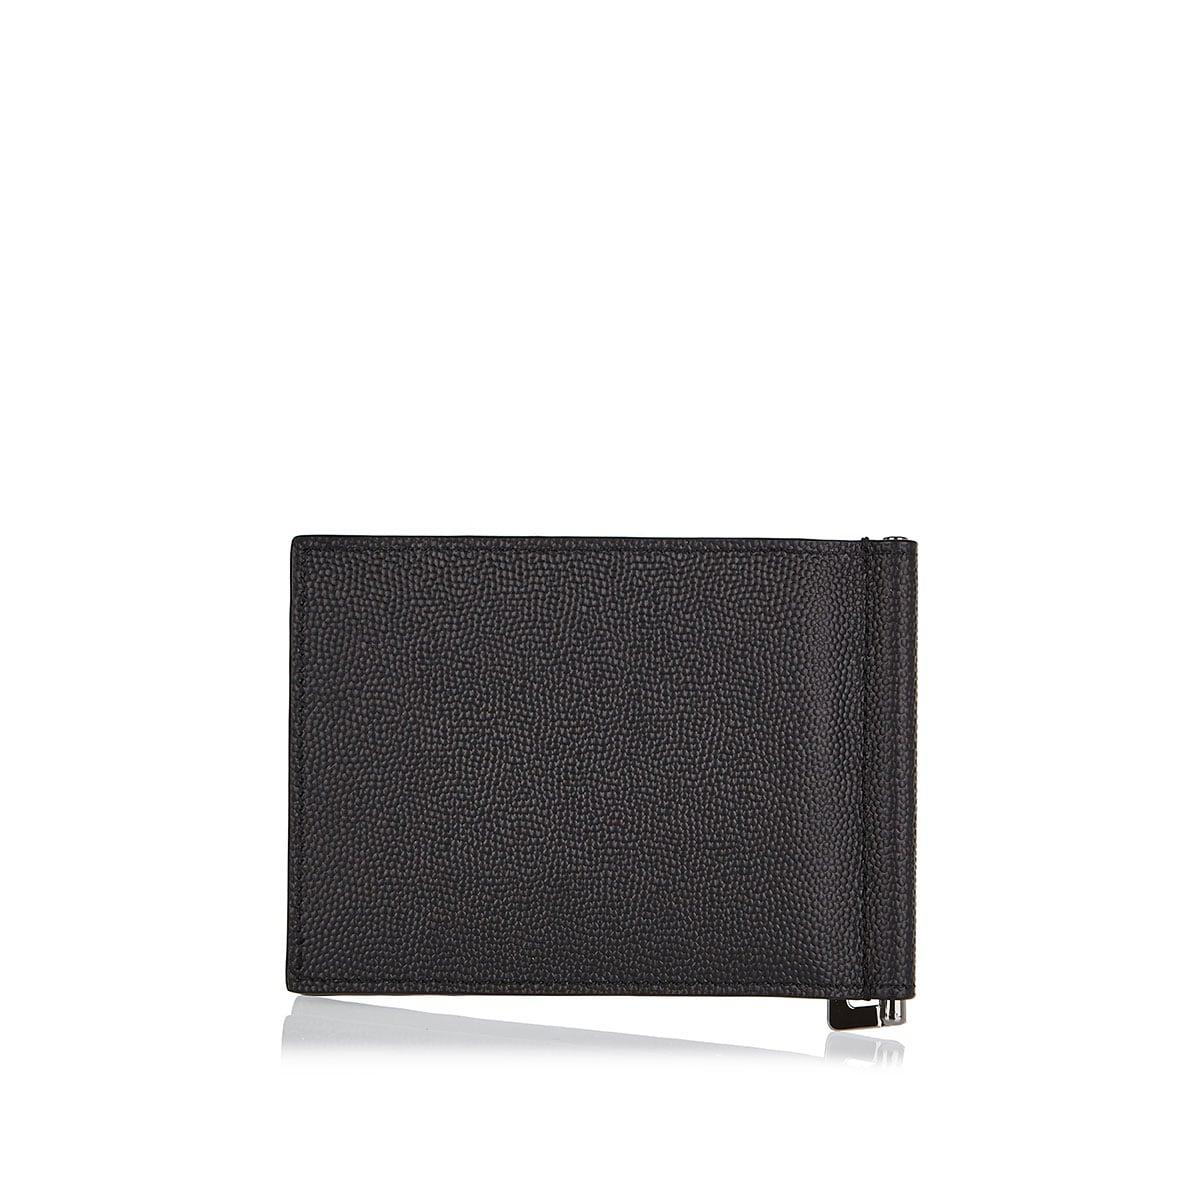 Monogram bi-fold leather wallet